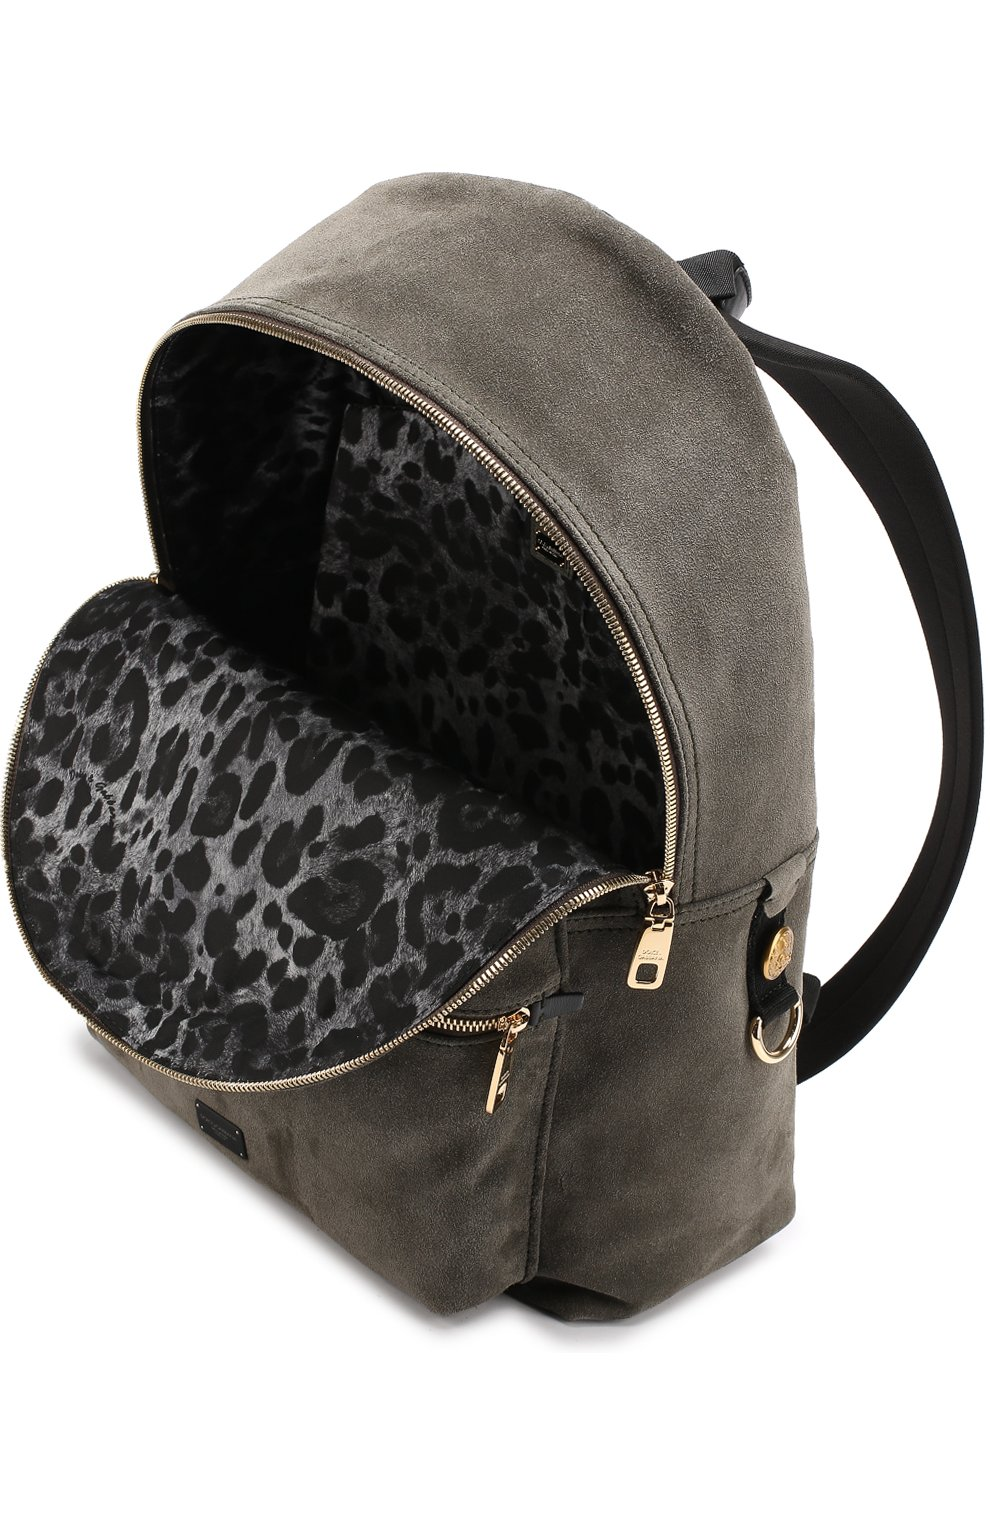 Замшевый рюкзак с внешним карманом на молнии Dolce & Gabbana хаки | Фото №4